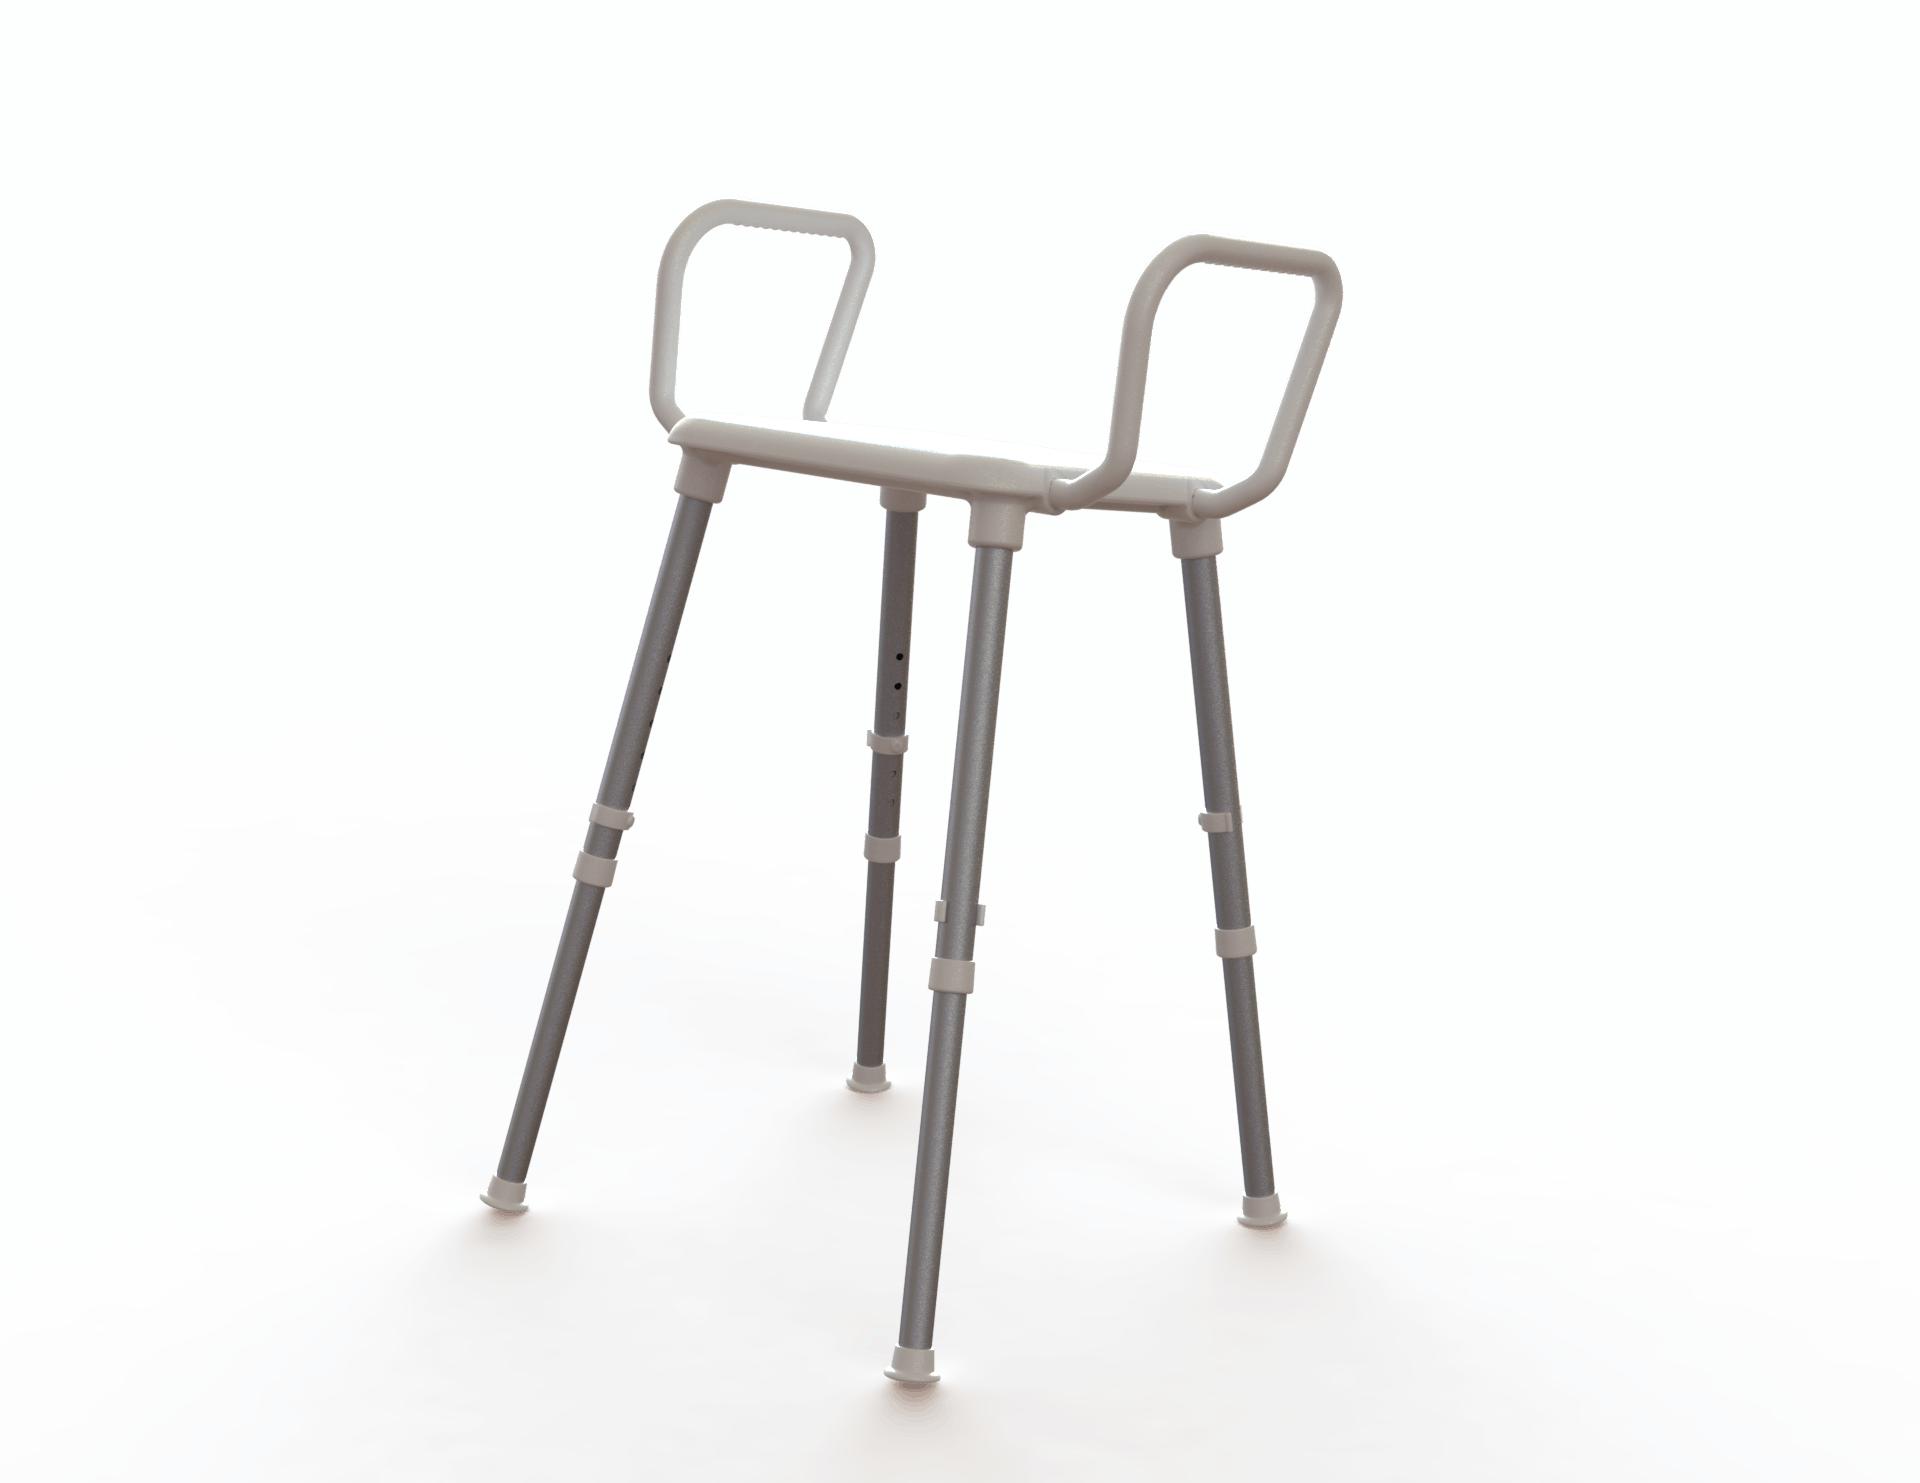 Shower Chairs Shoprider Australia